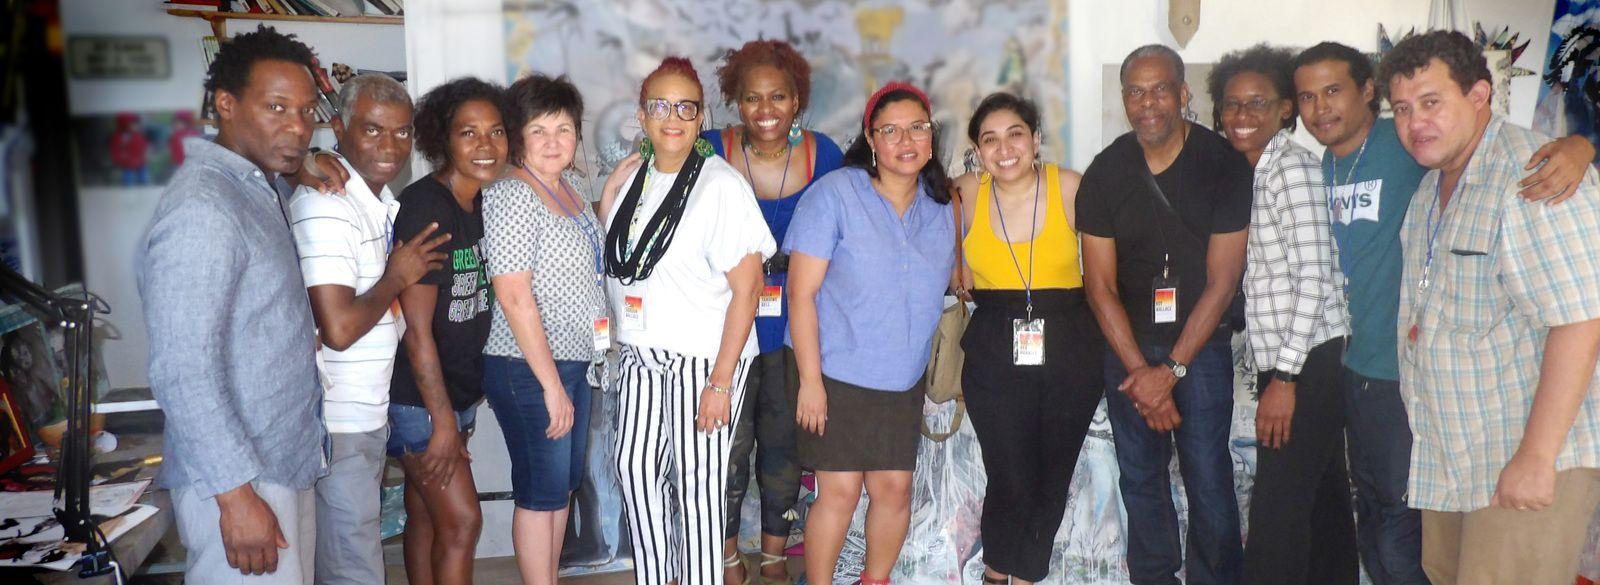 DVCAI Guadeloupe, 2020 /Diaspora Vibe Cultural Arts Incubator